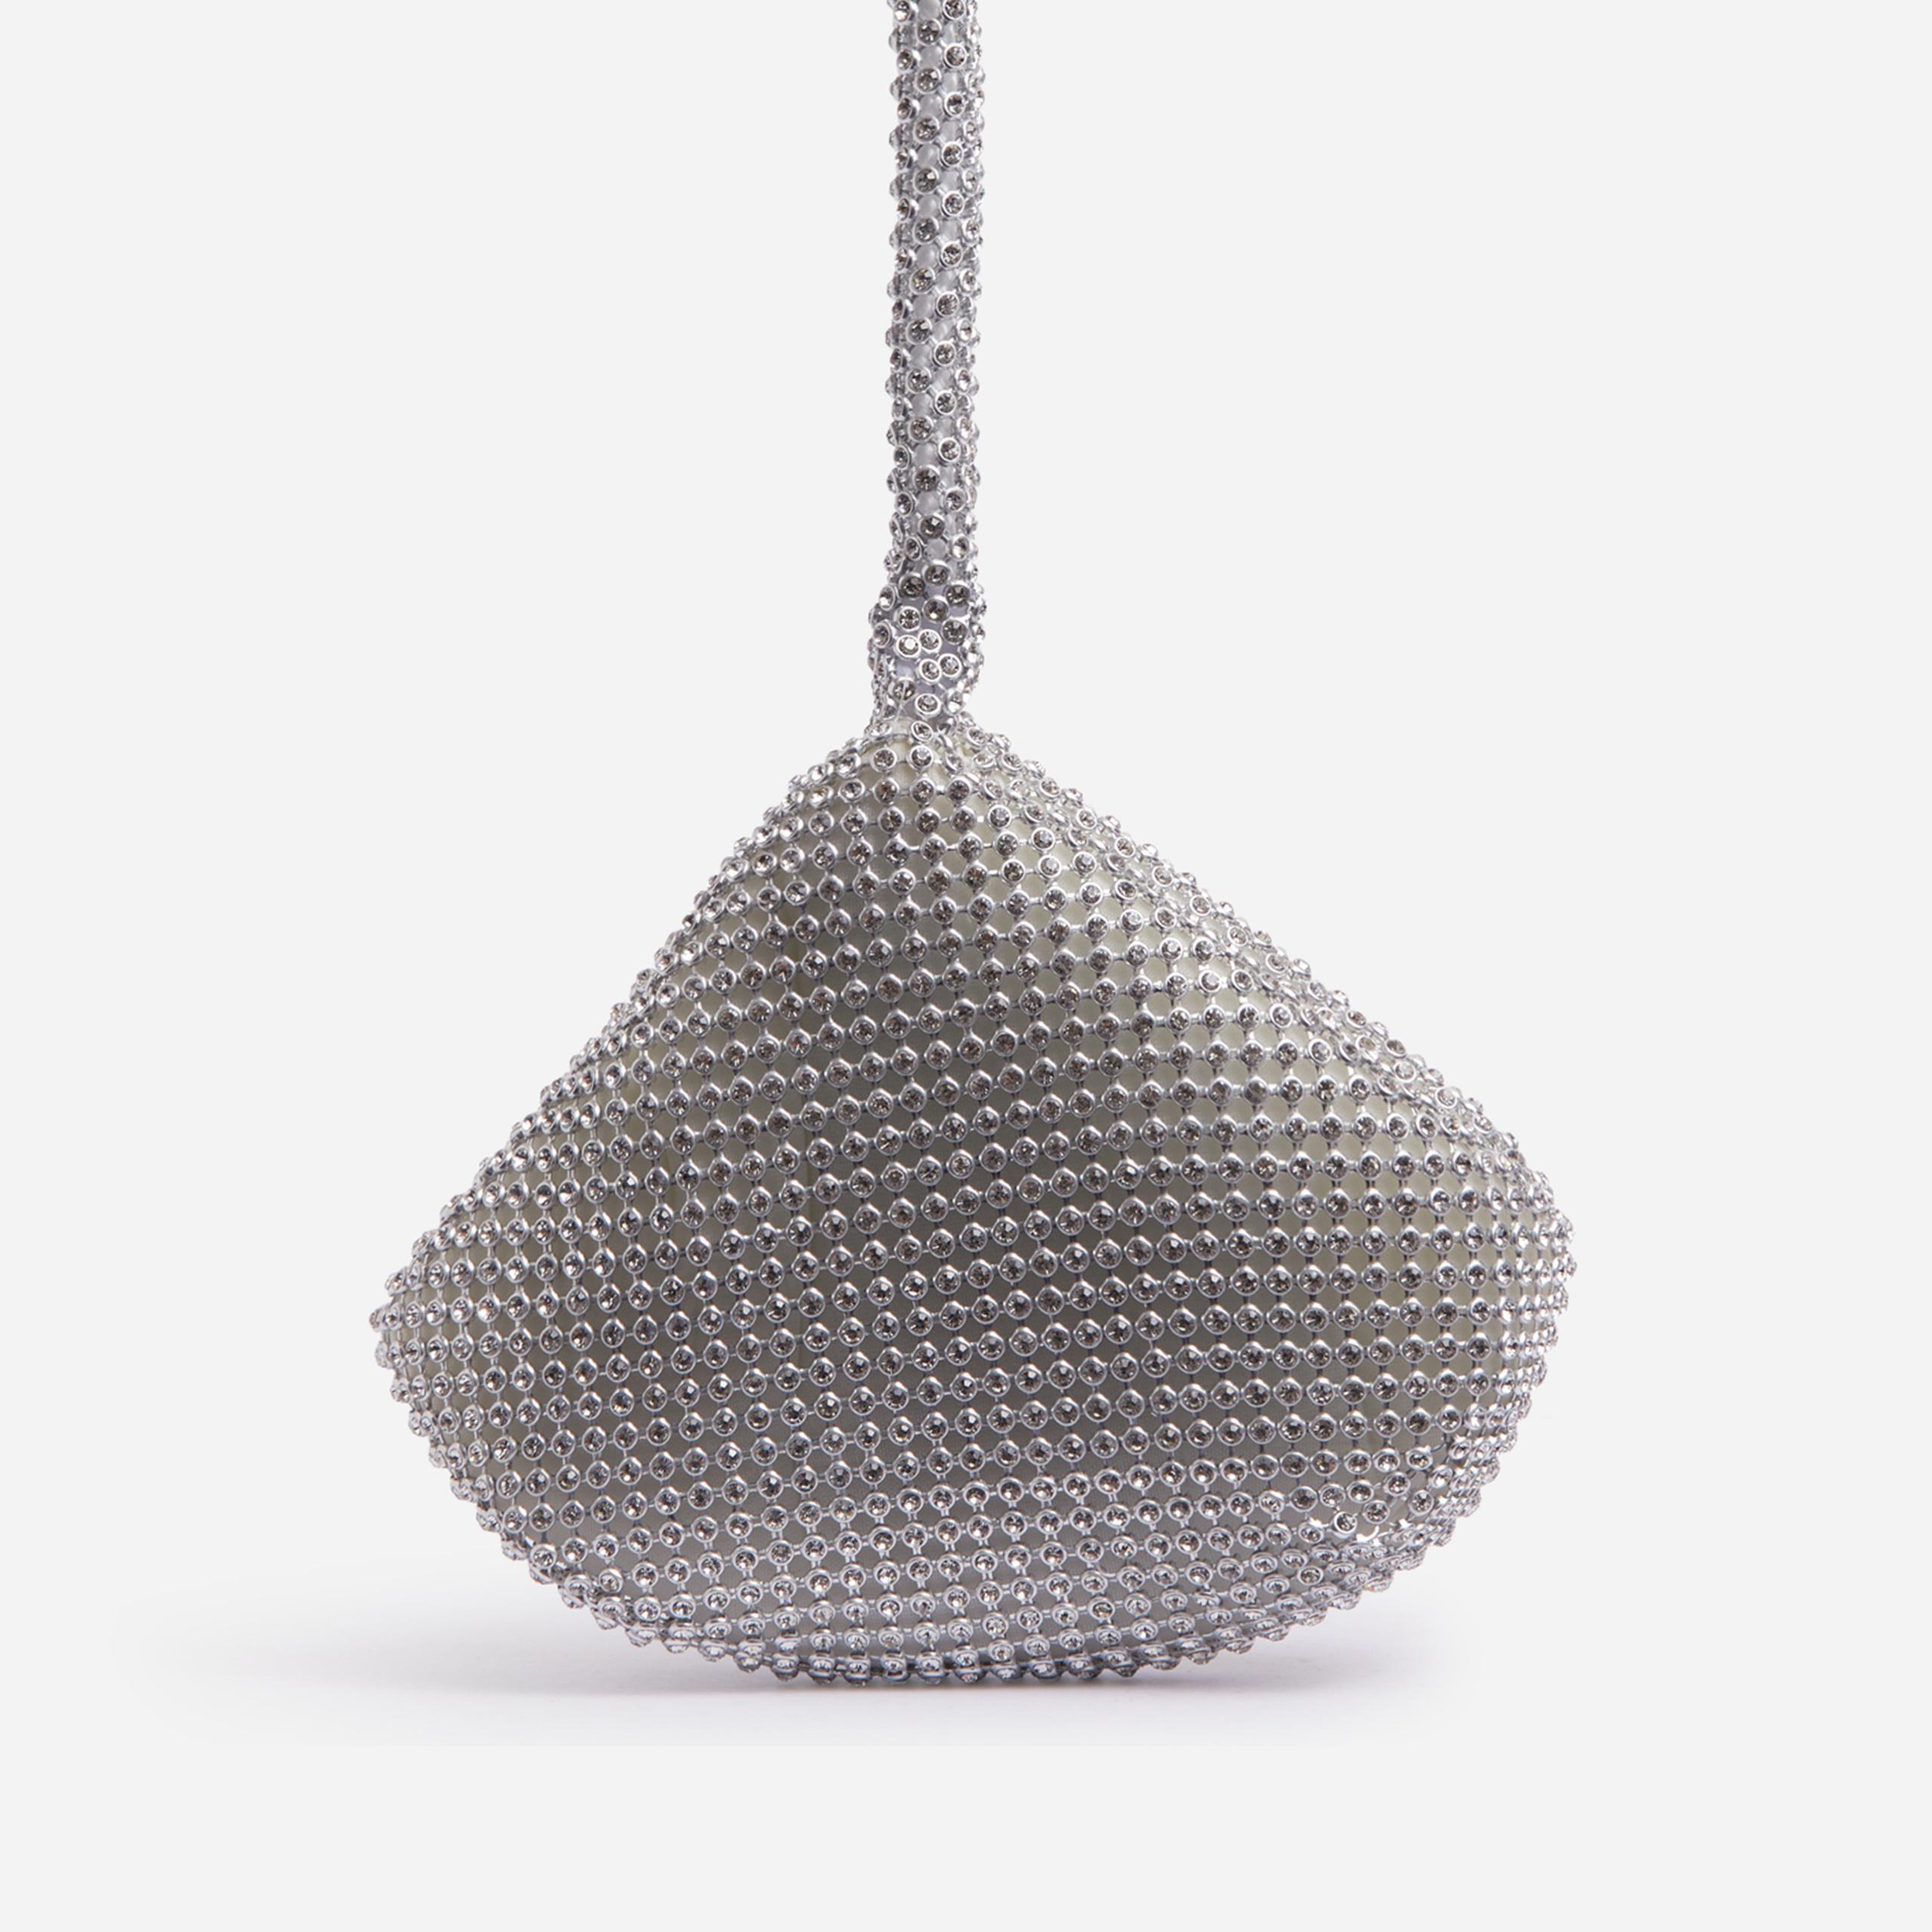 EGO Mini Pyramid Grab Bag In Silver Diamante,, Silver  - female - Size: One Size